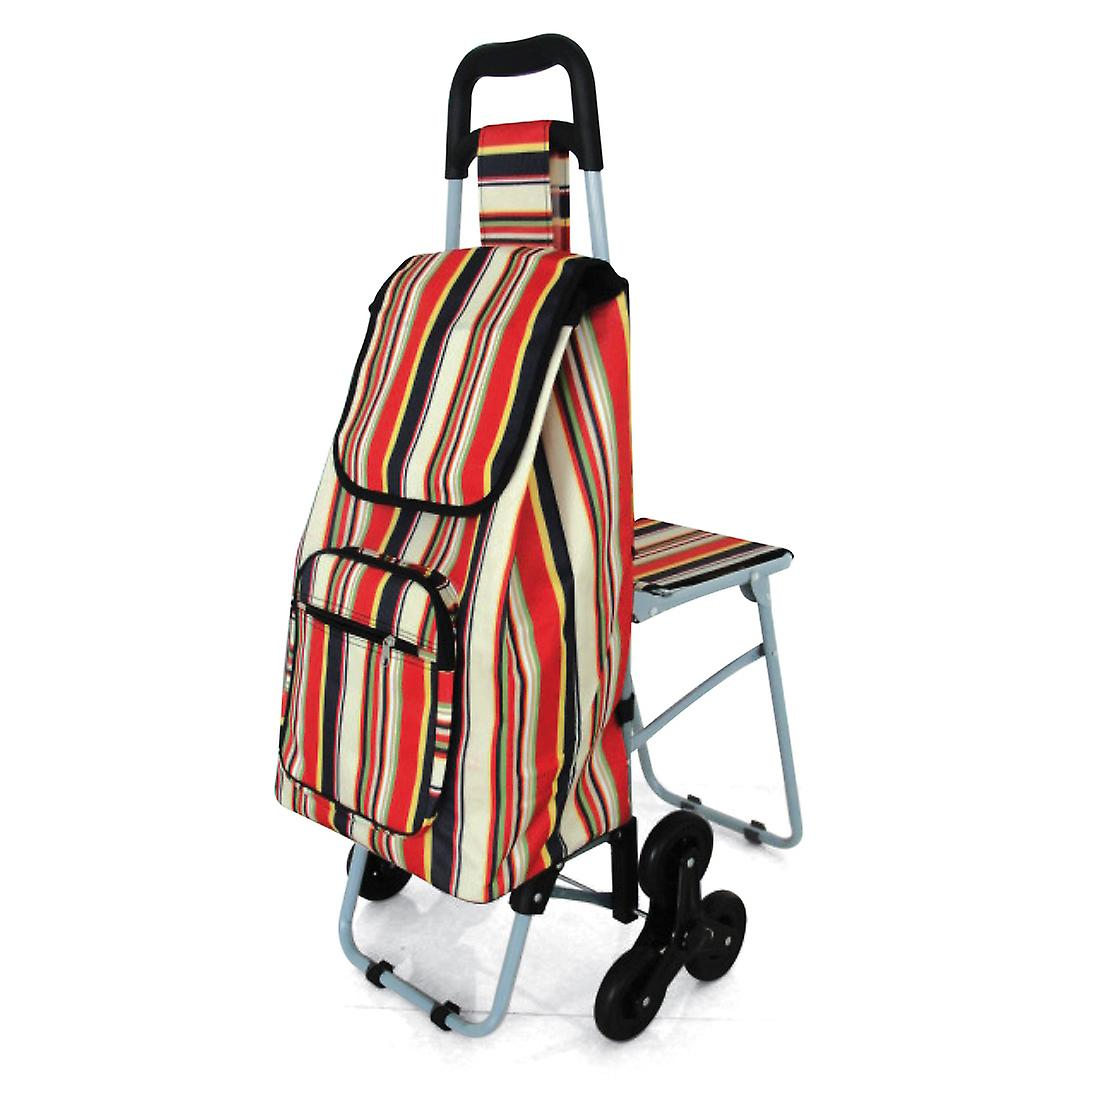 Leisure Trolley with Seat - Triple Wheel